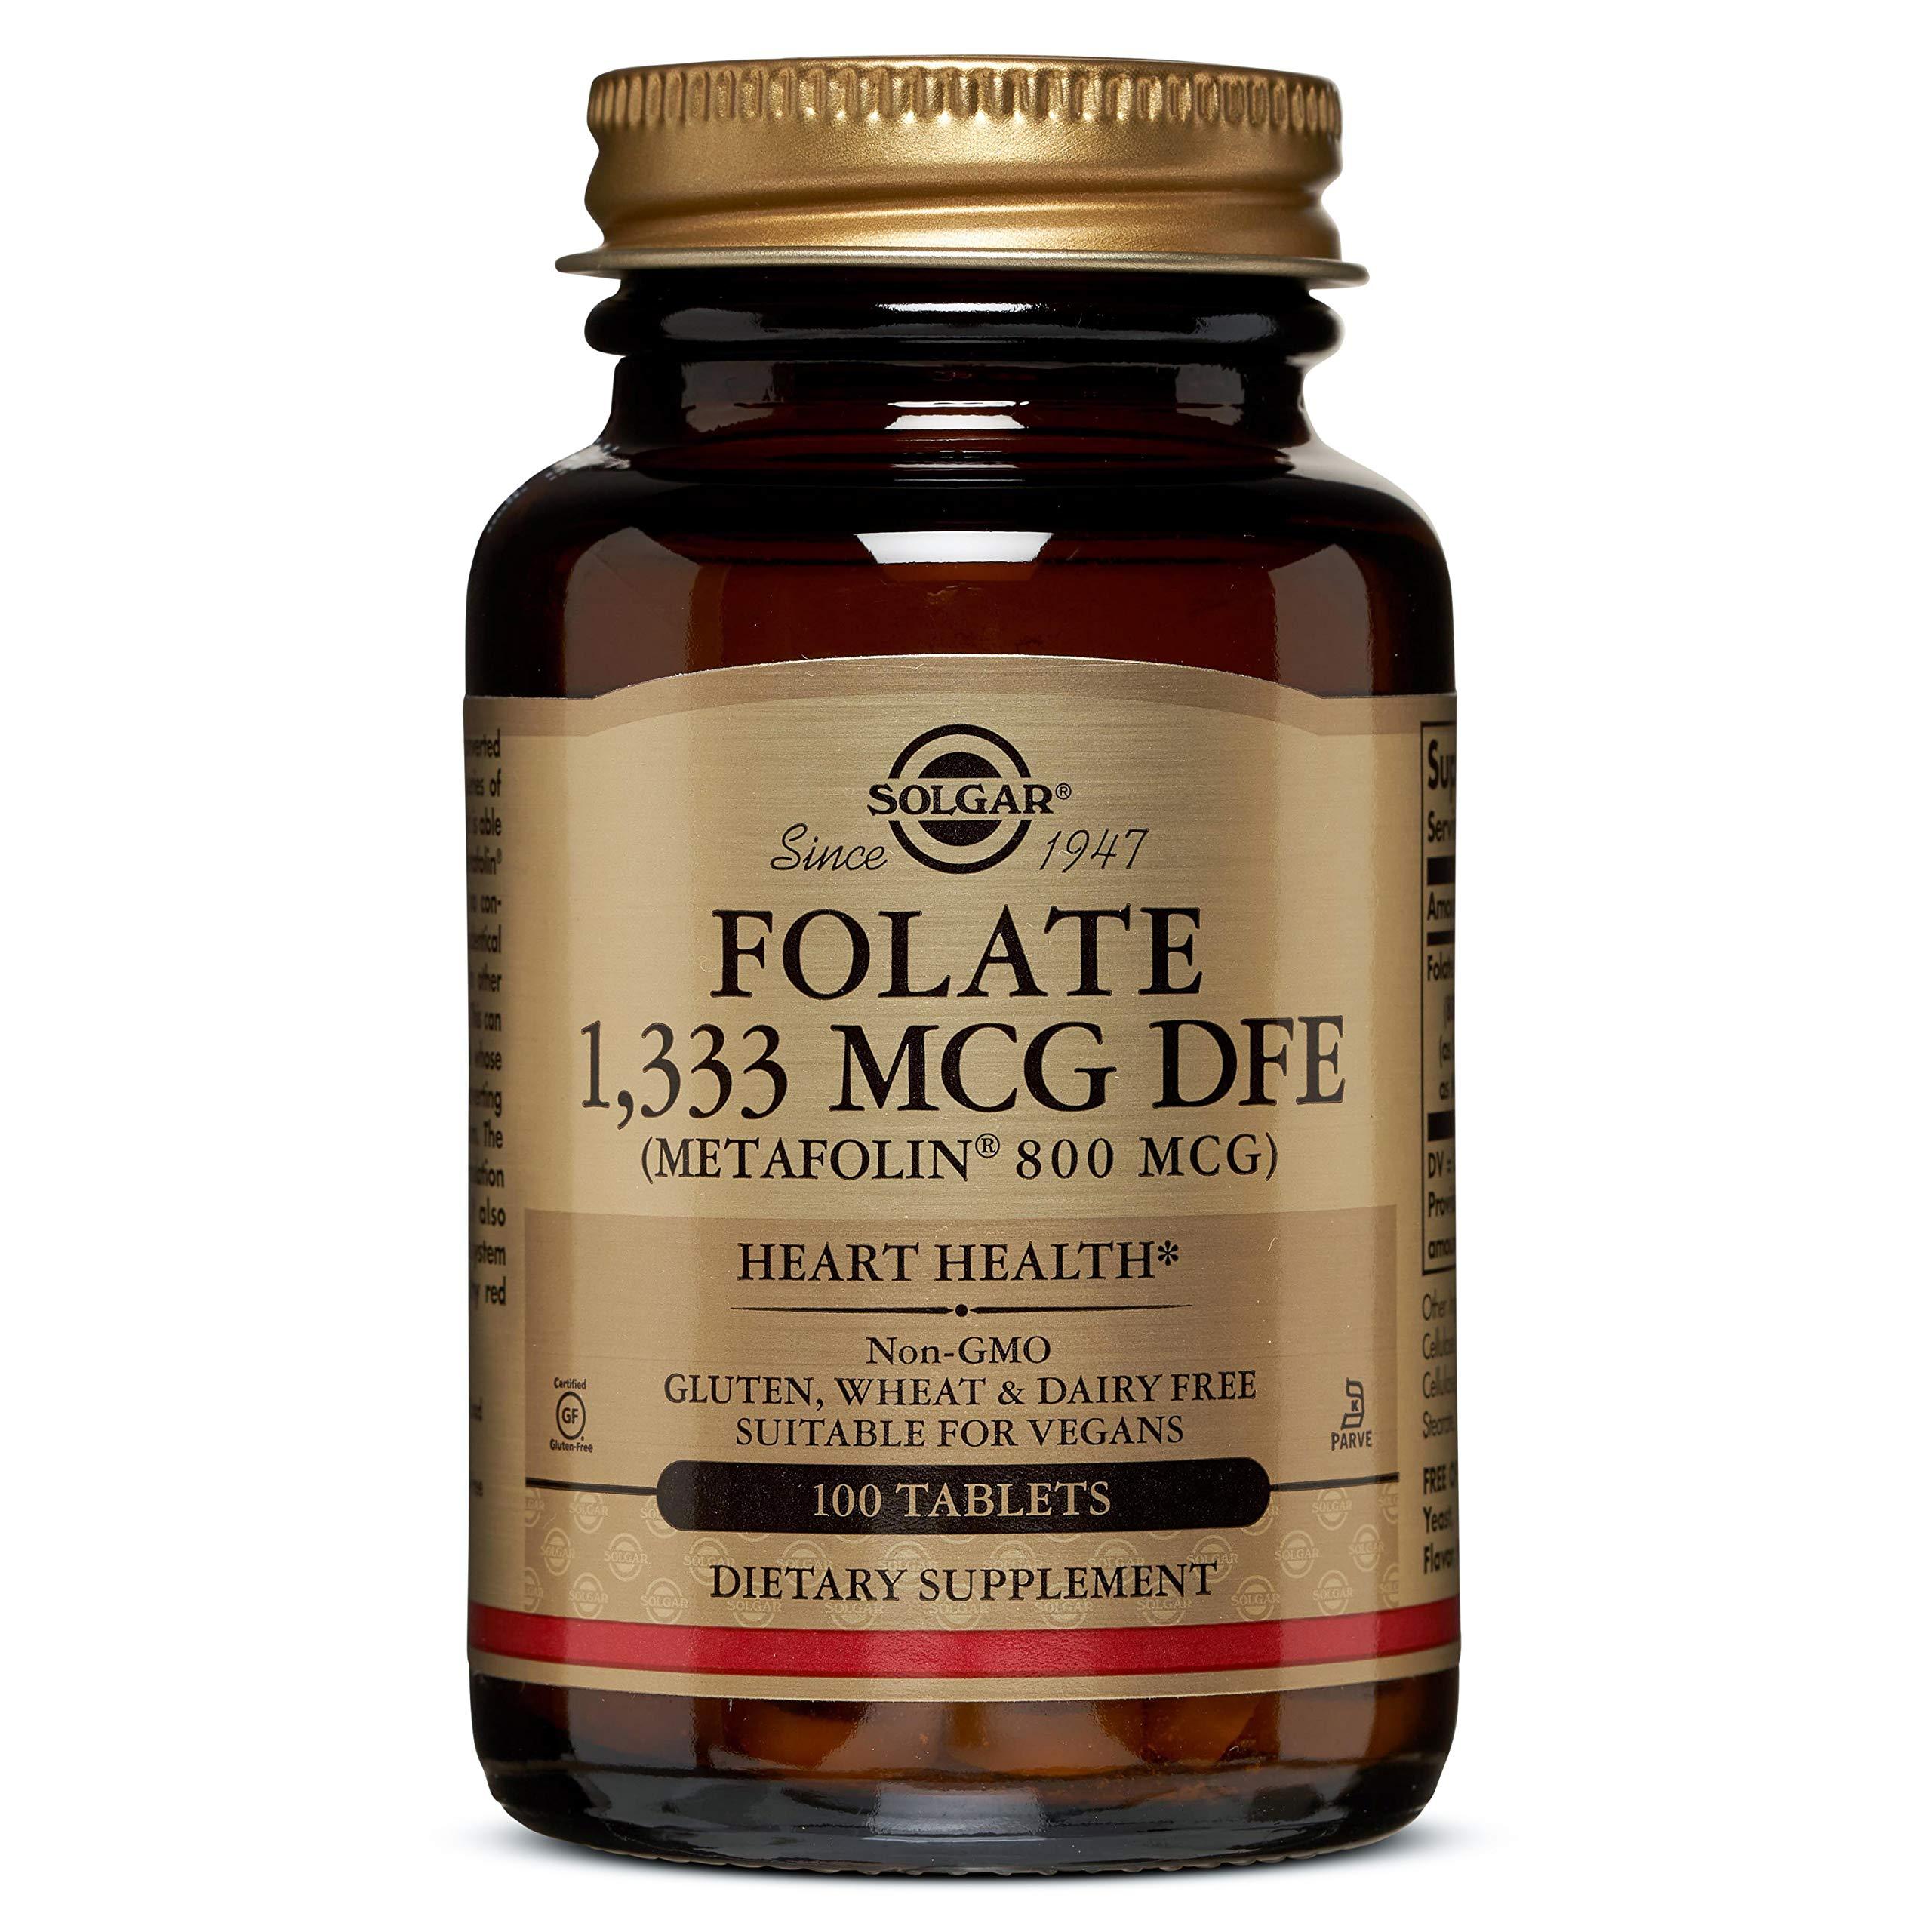 Solgar Folate 1,333 MCG DFE (Metafolin 800 MCG) - 100 Tablets